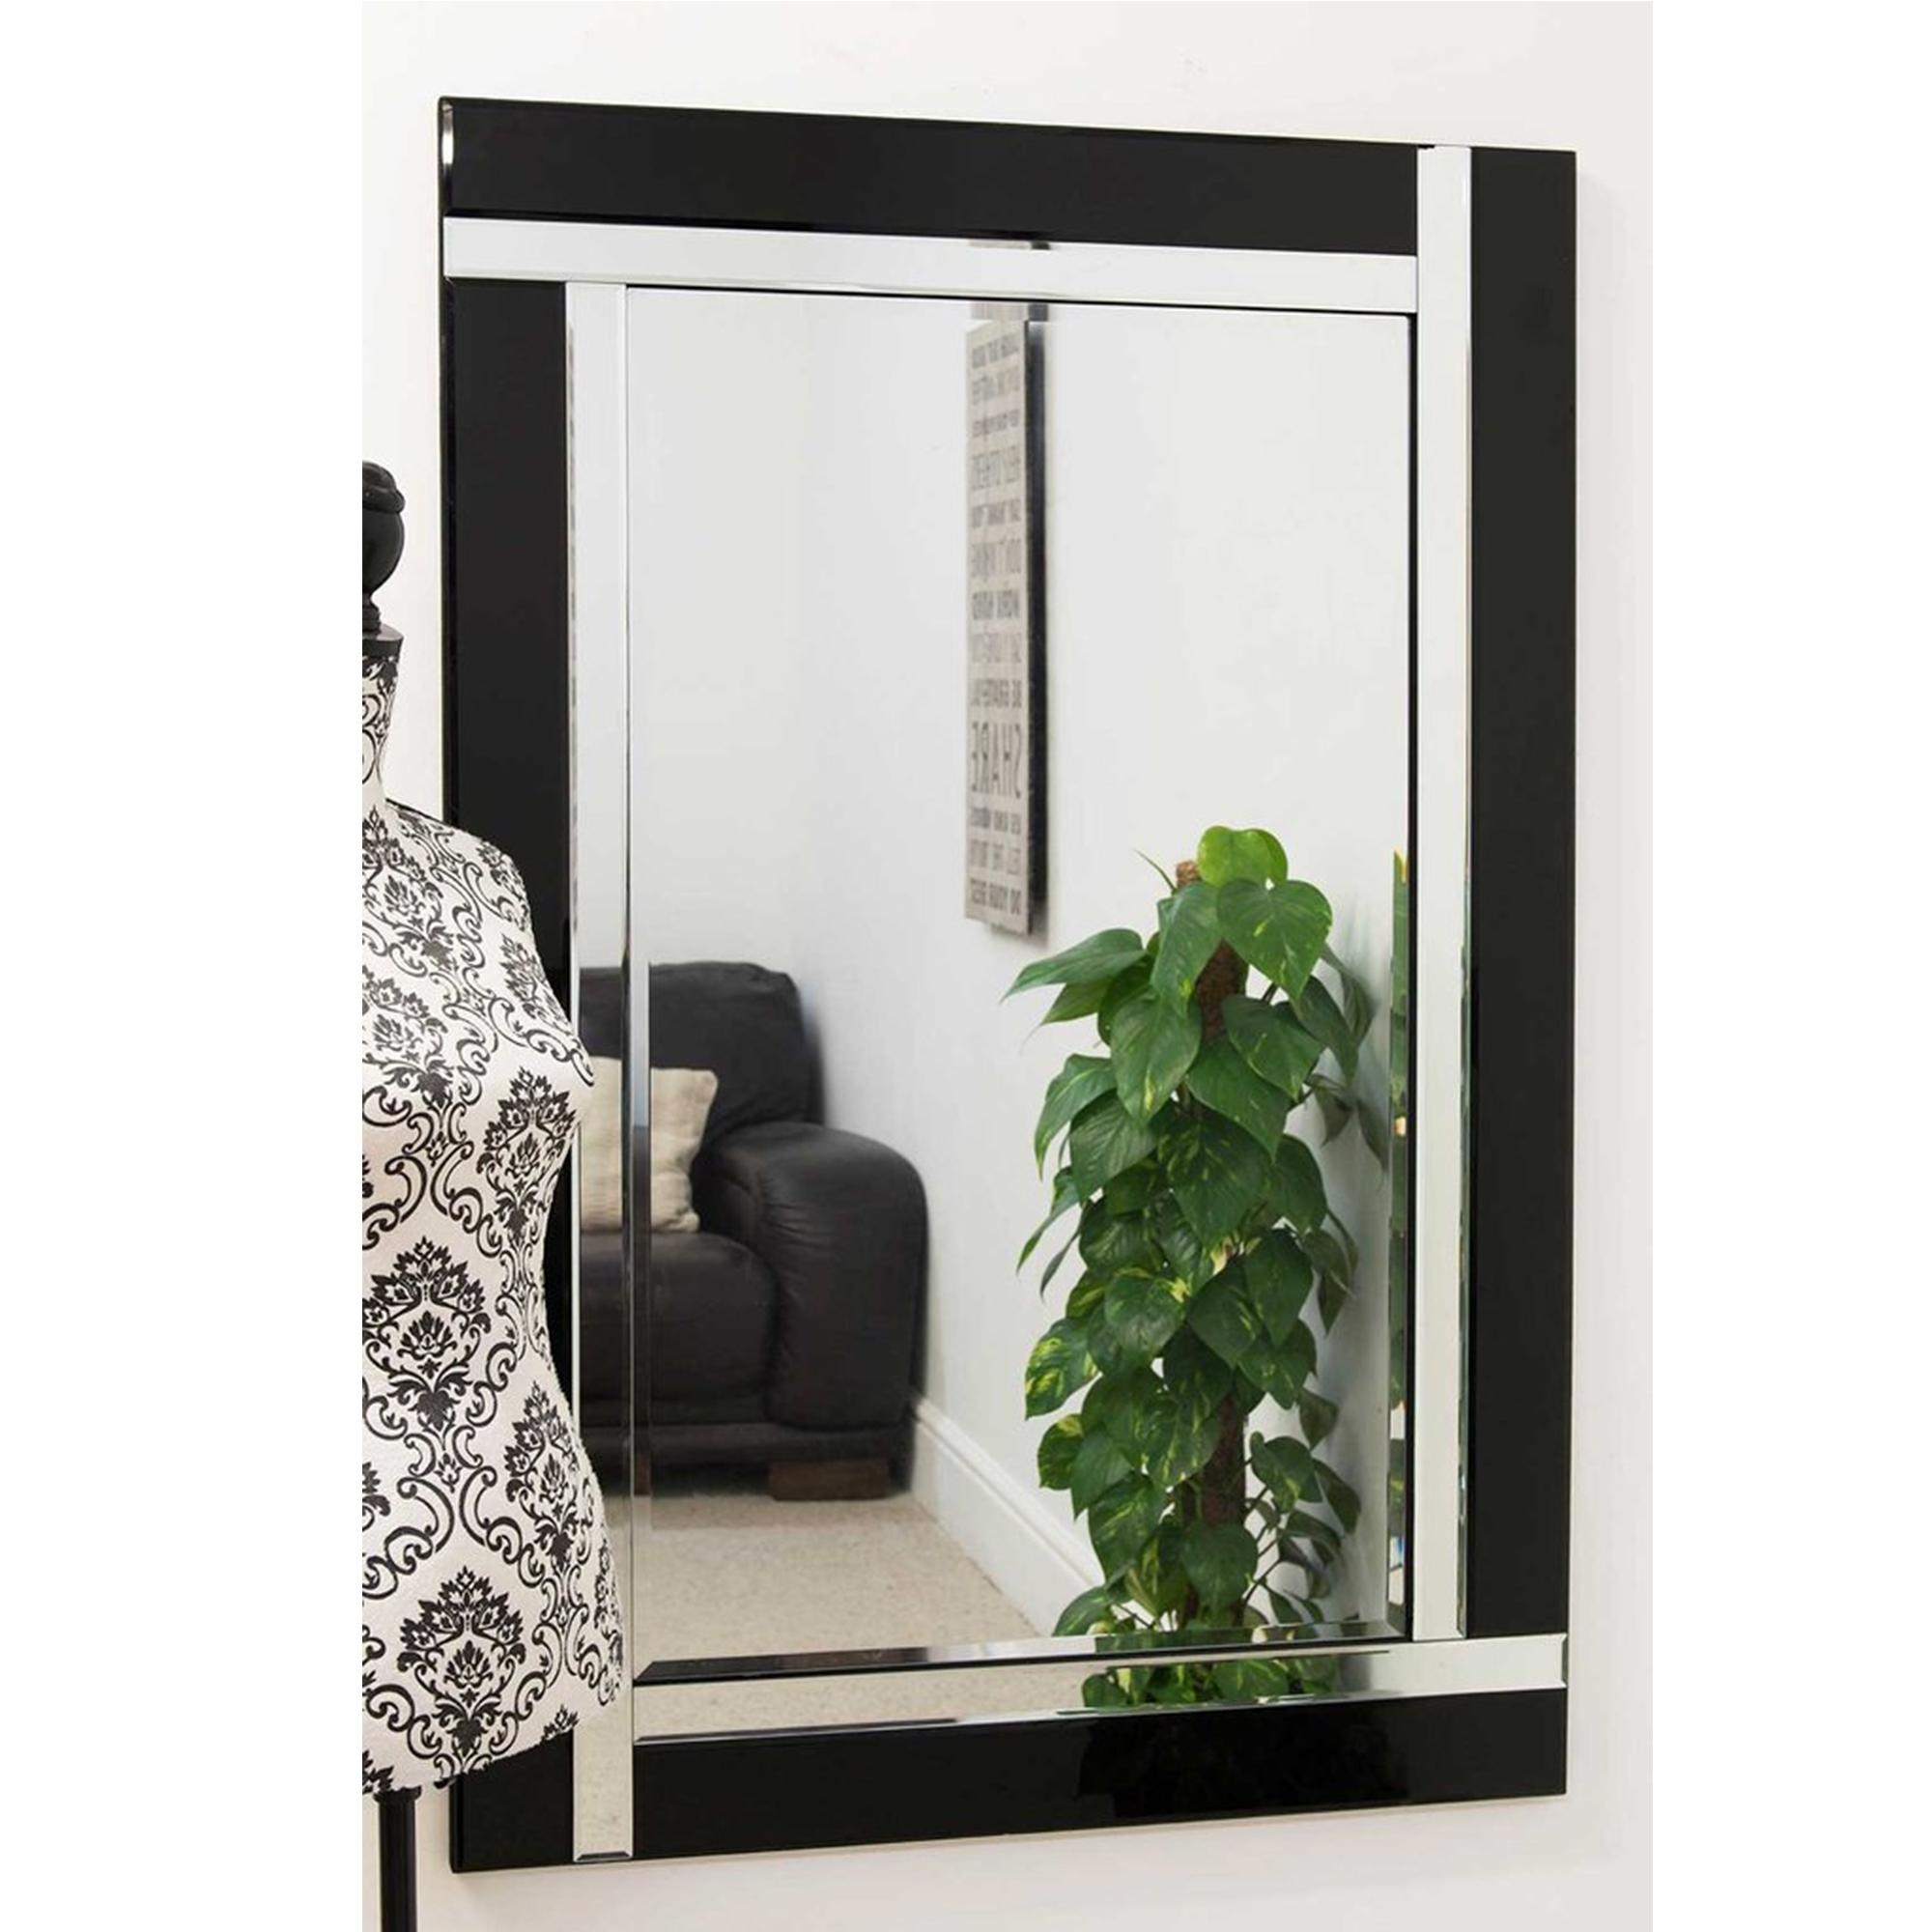 Large contemporary black venetian mirror decorative for Black venetian mirror